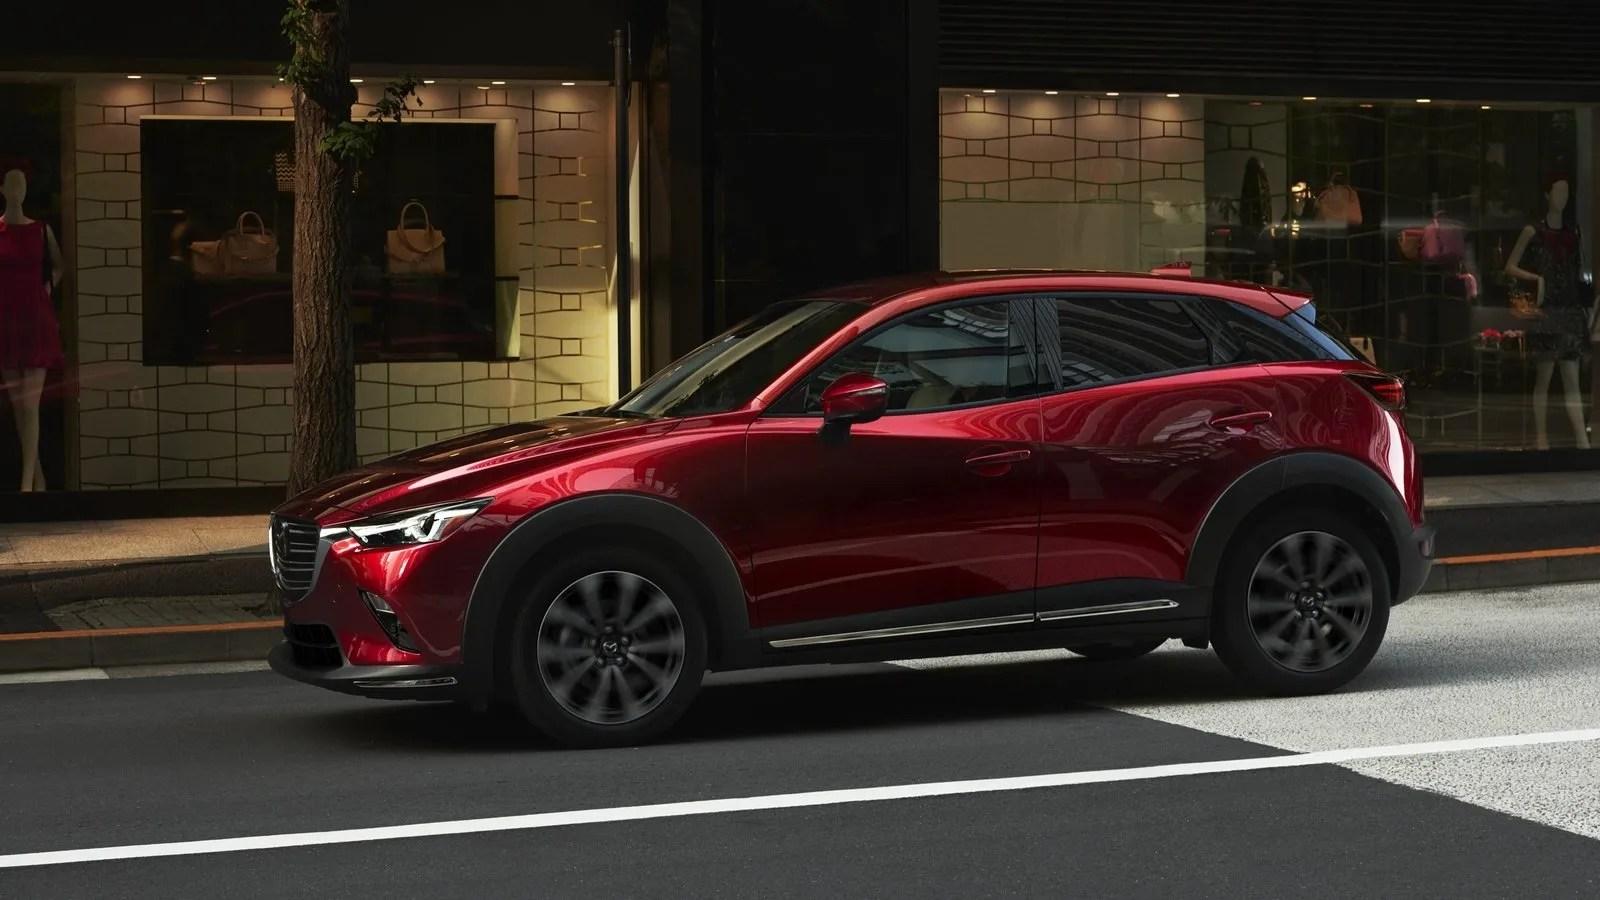 2019 Mazda Cx 3 Top Speed